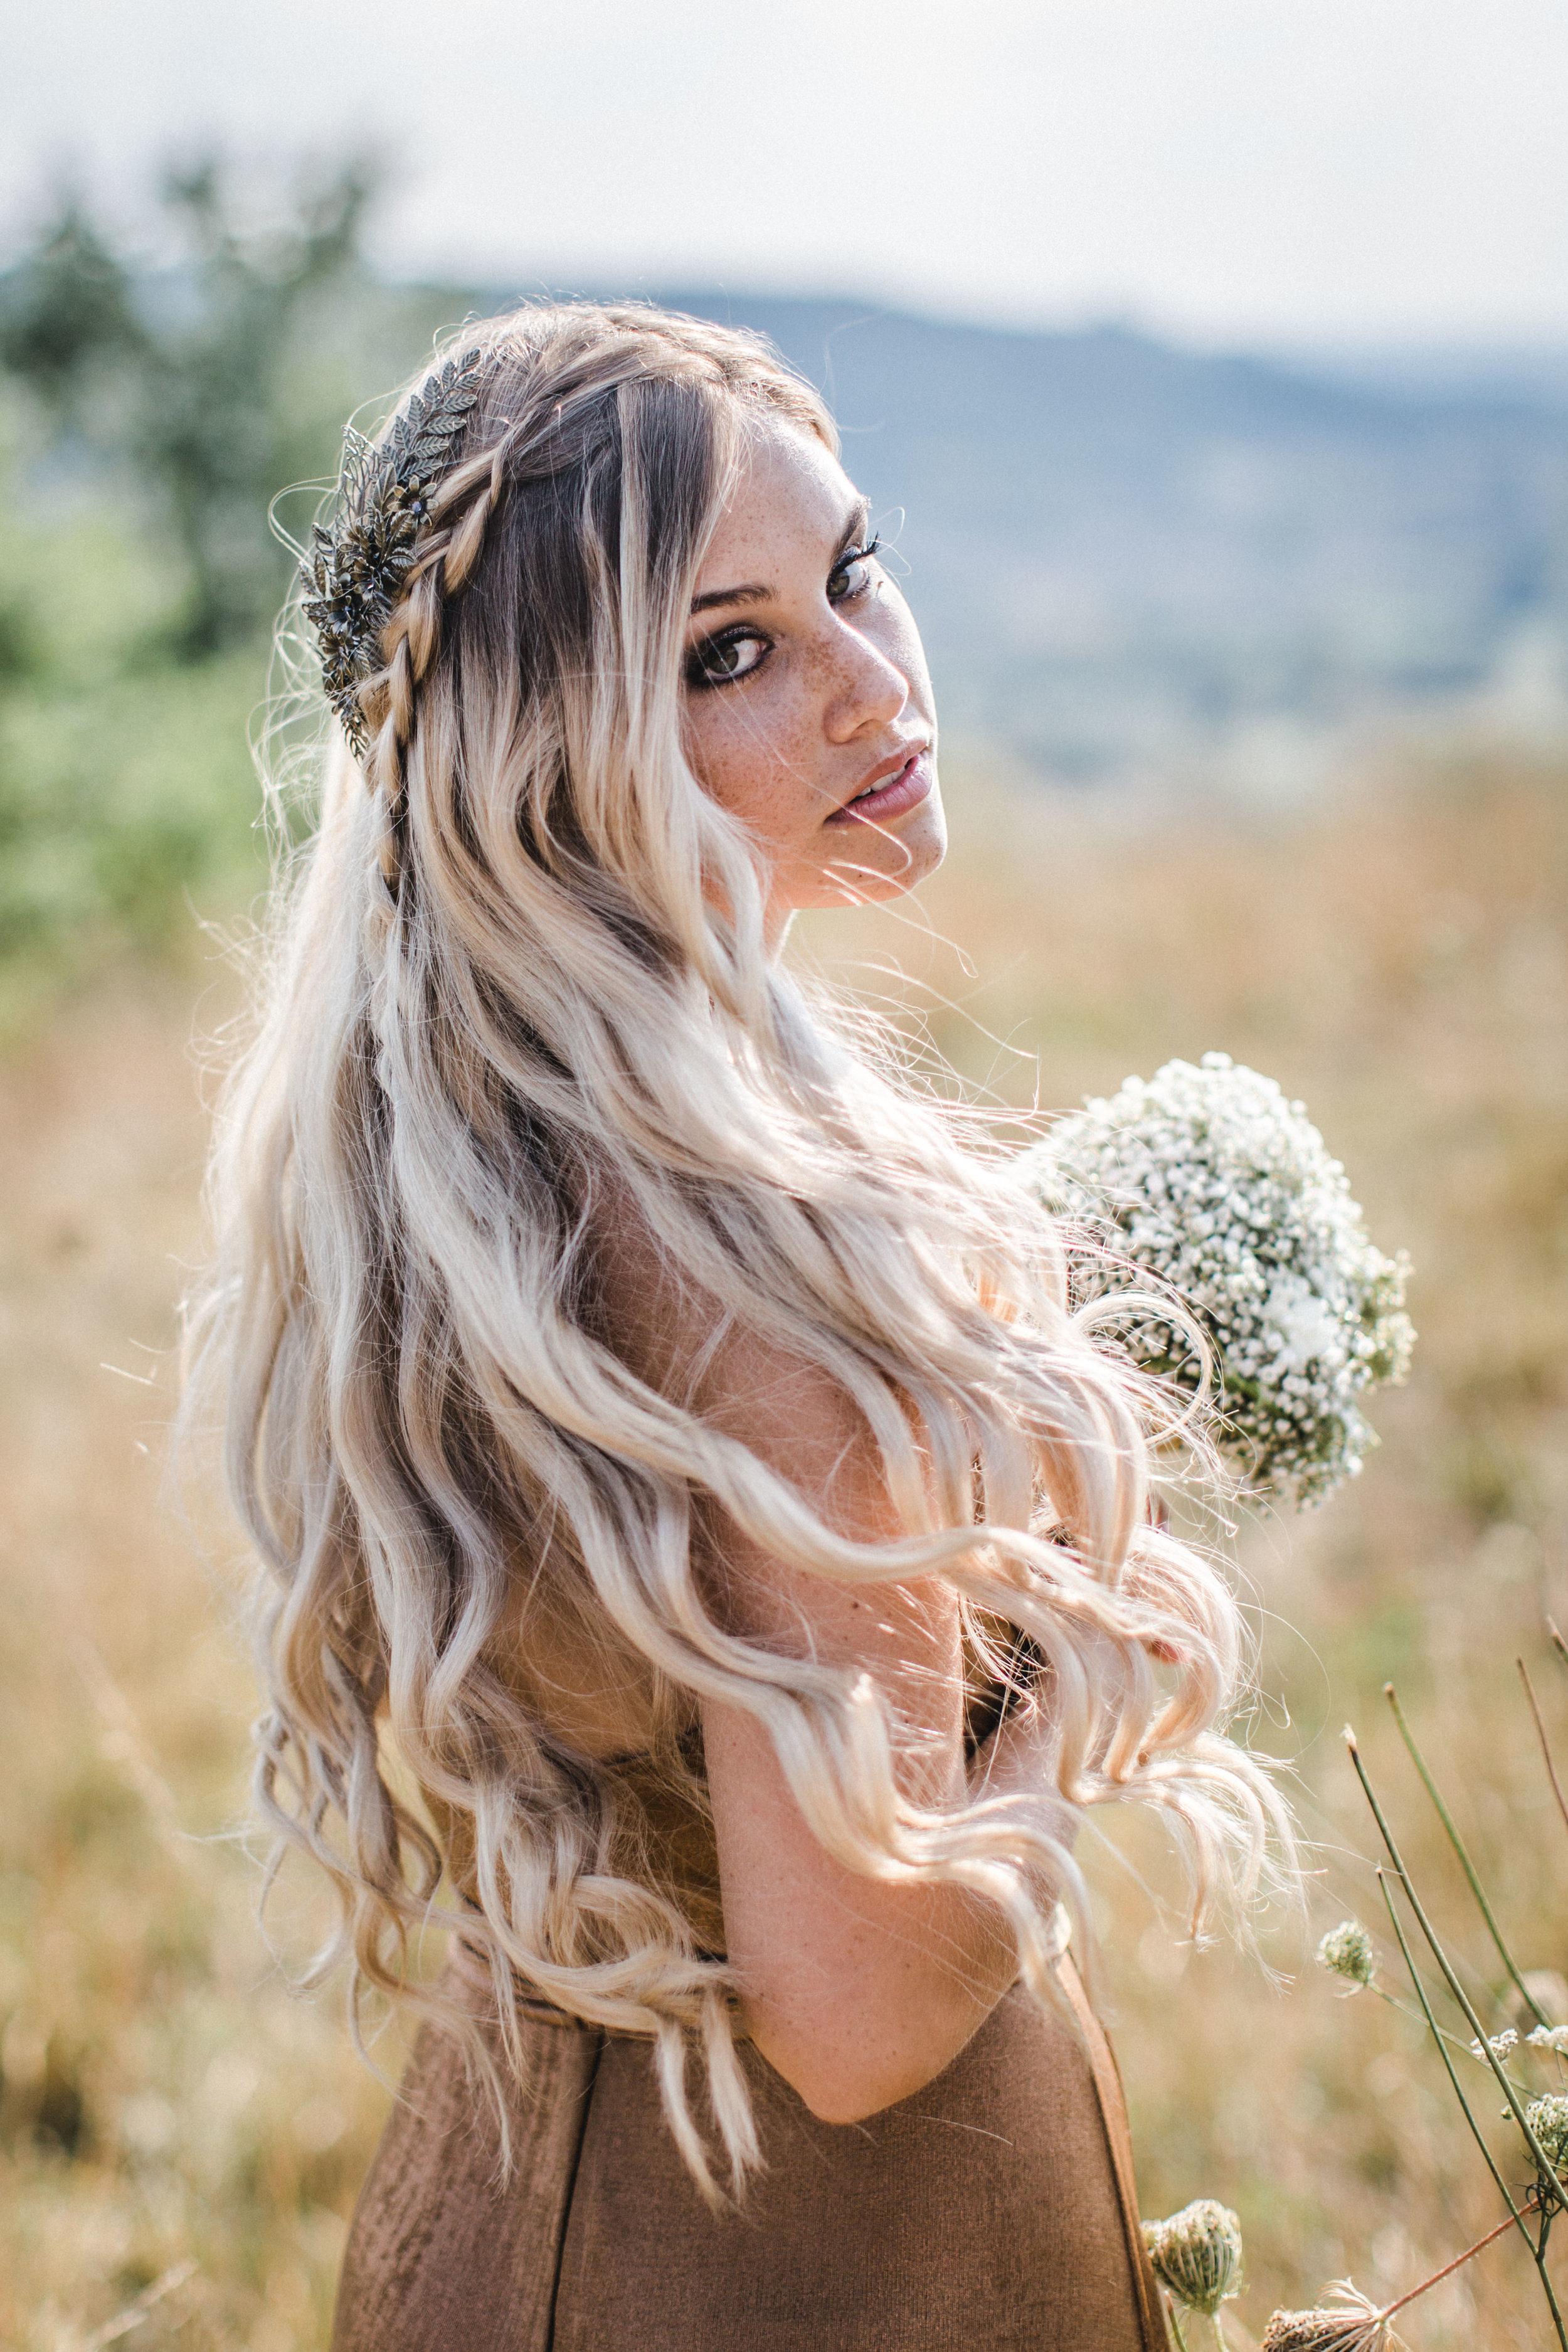 yessica-baur-fotografie-styleshooting-golden-summer-tübingen-555-5464.JPG